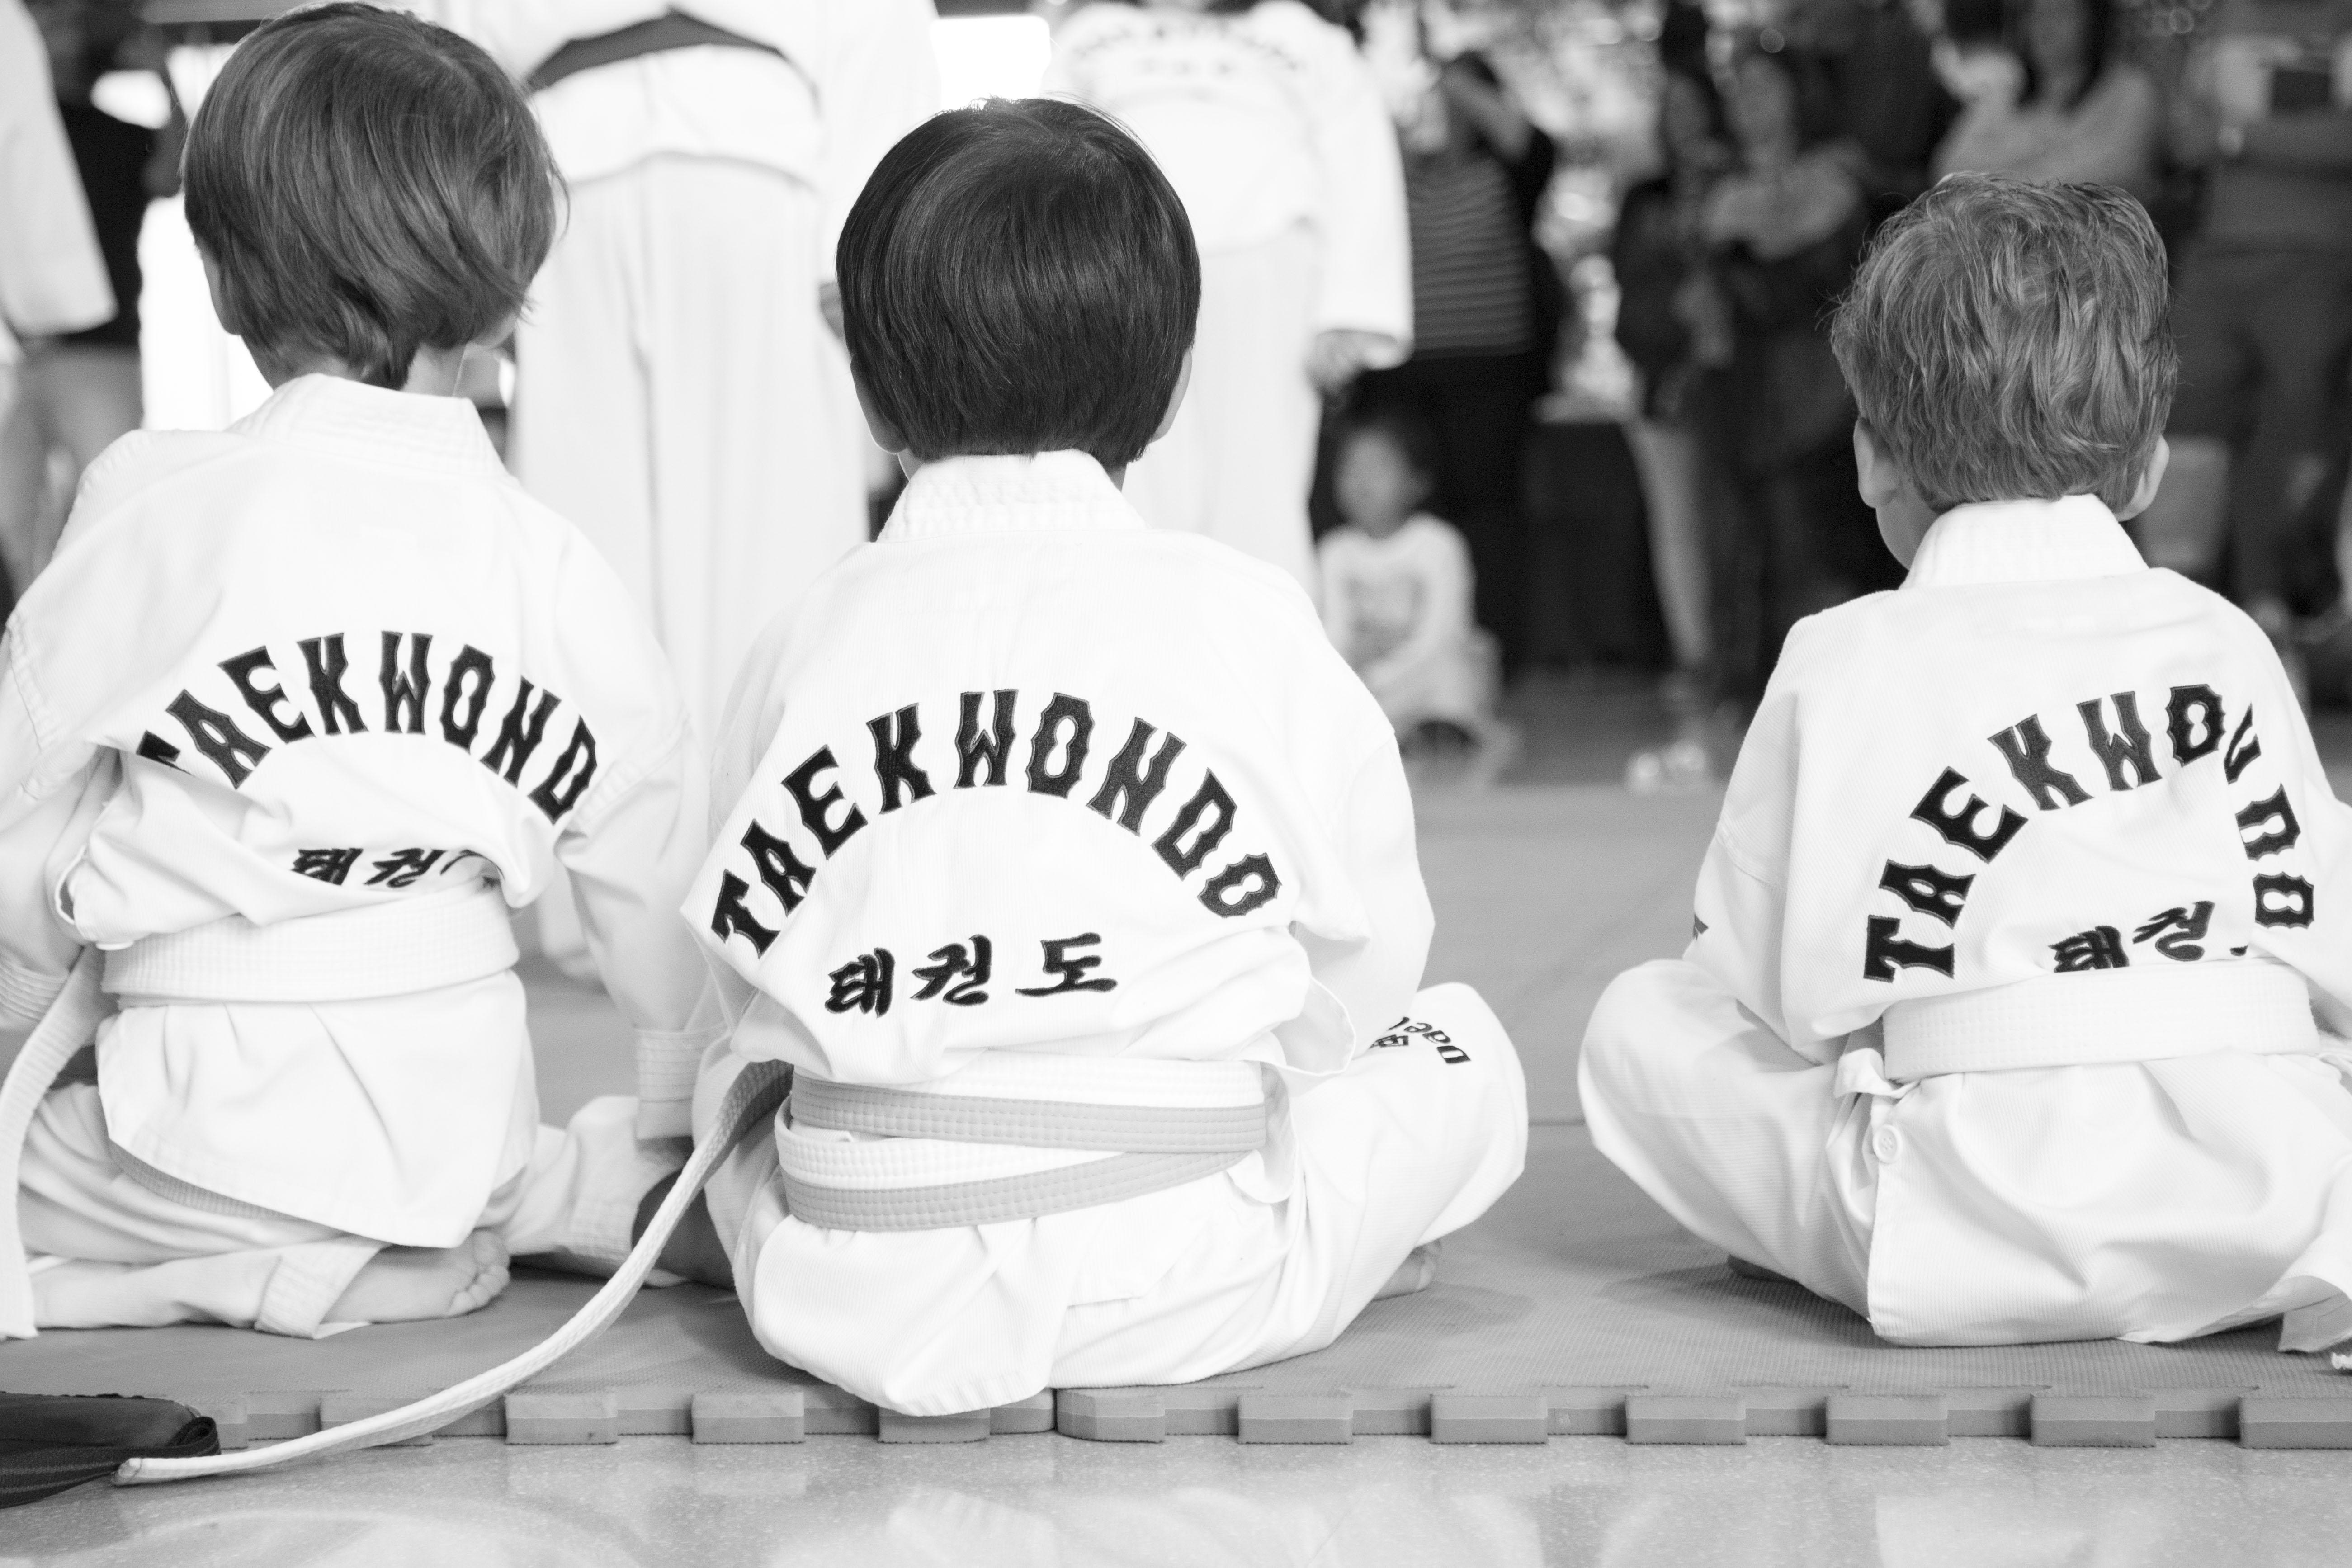 Mangafest 2016 artes marciales - Artes marciales sevilla ...